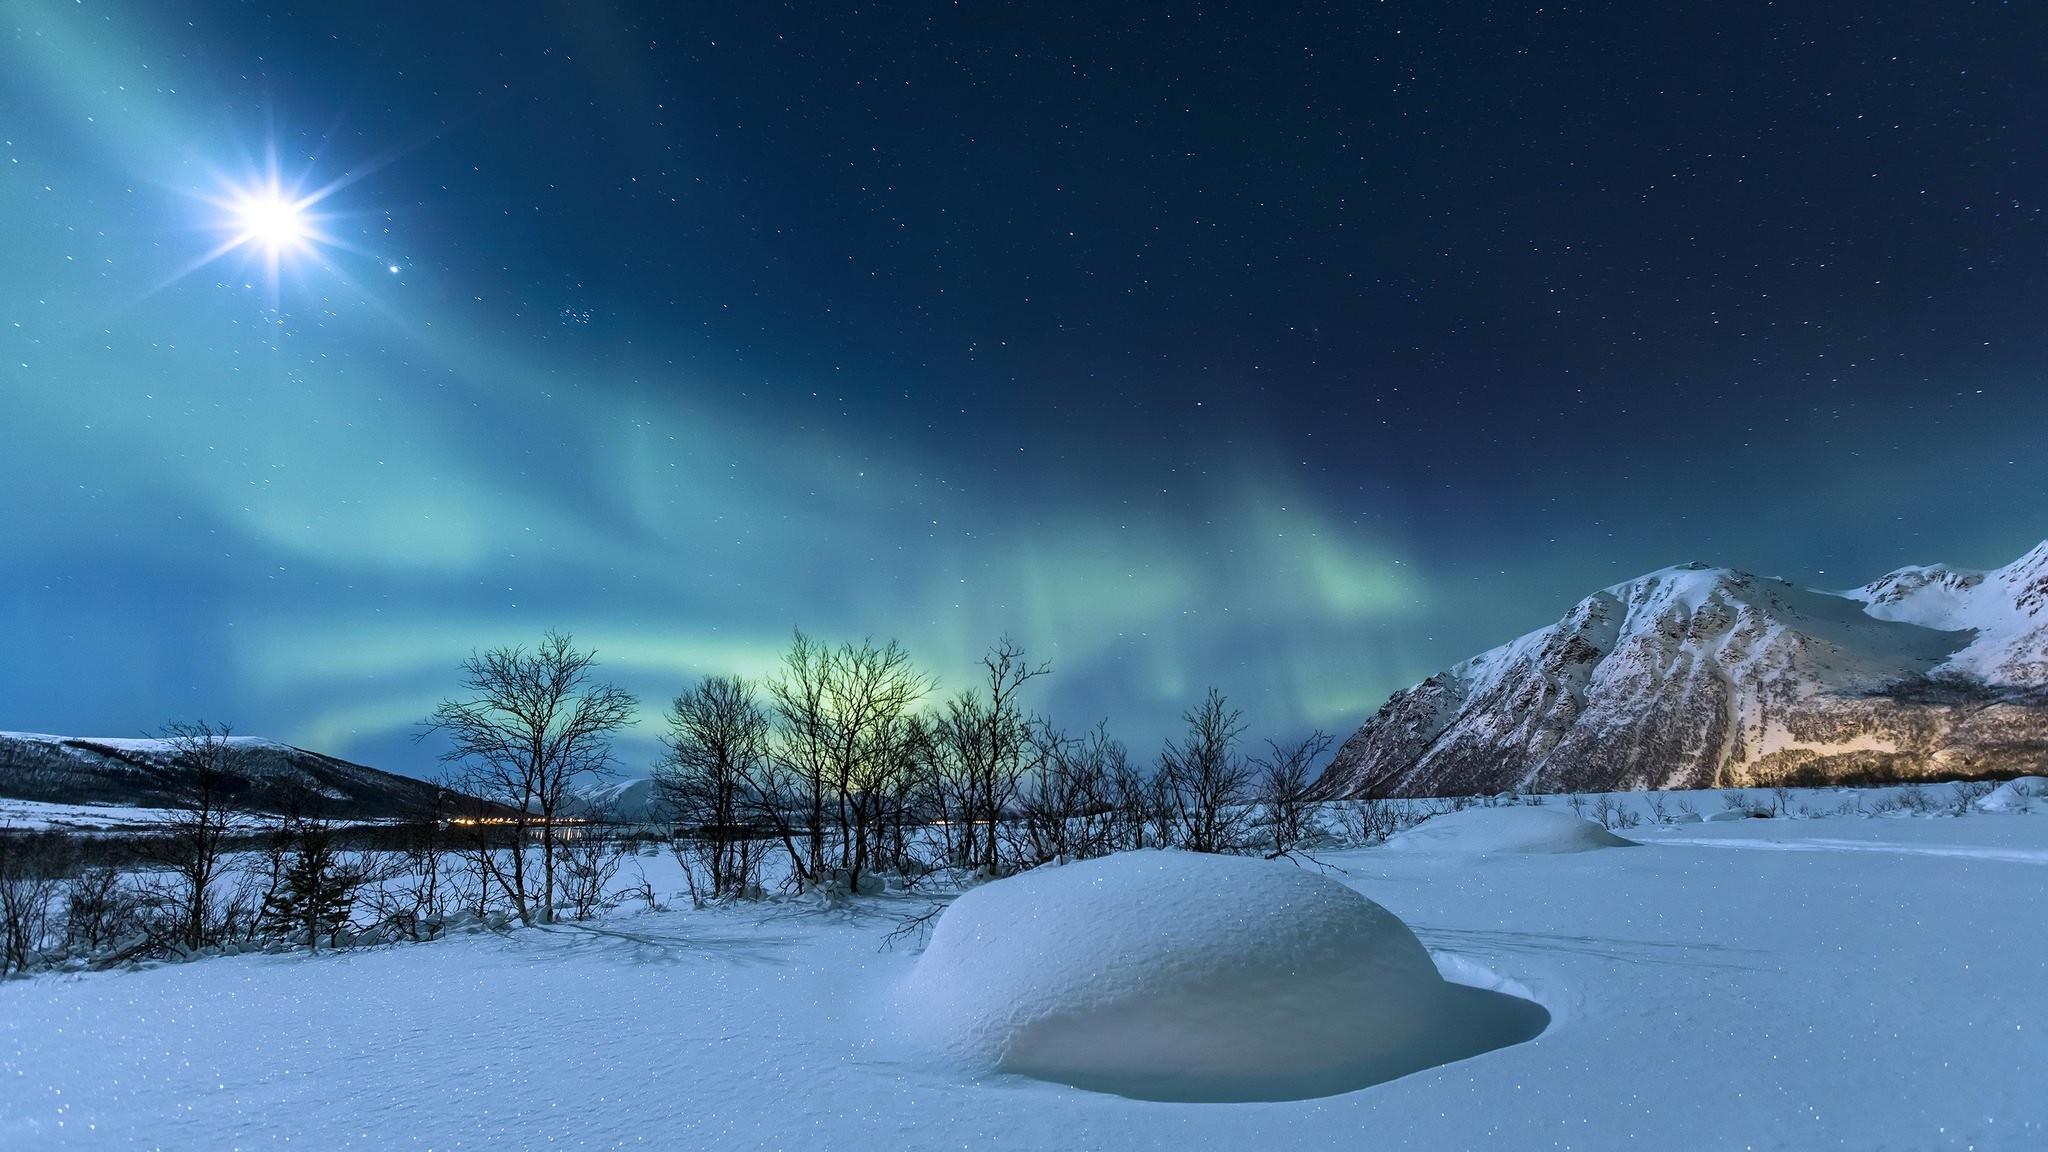 Norway Winter Night